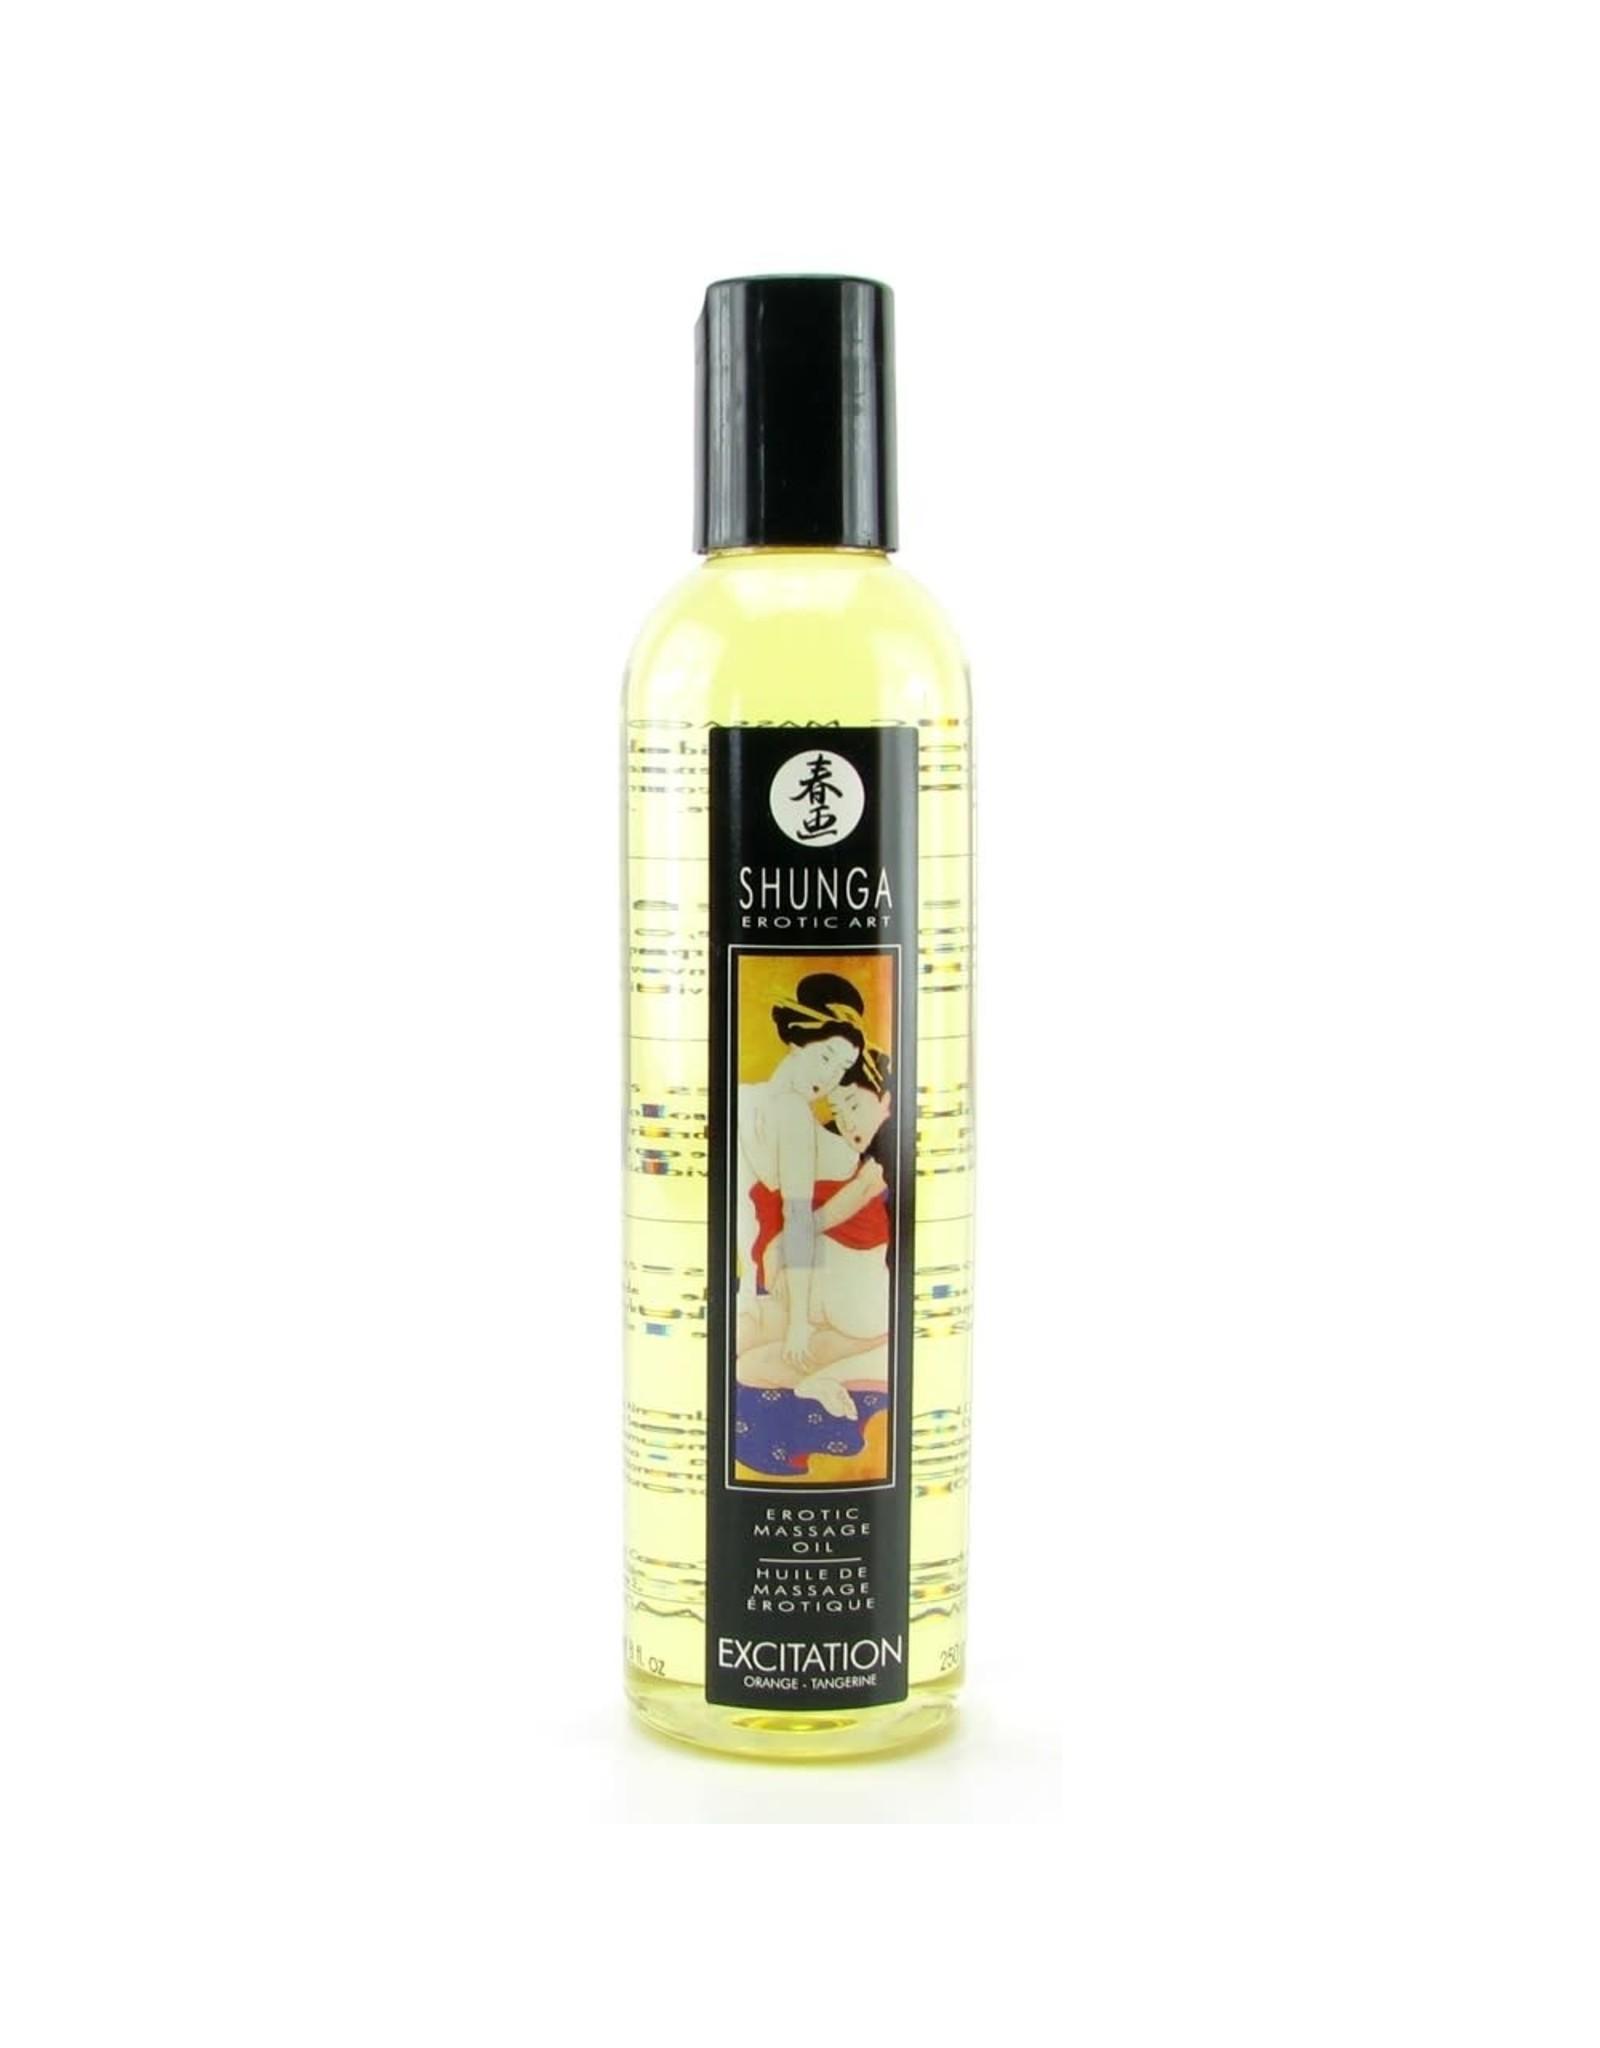 Shunga Shunga Erotic Massage Oil - Excitation